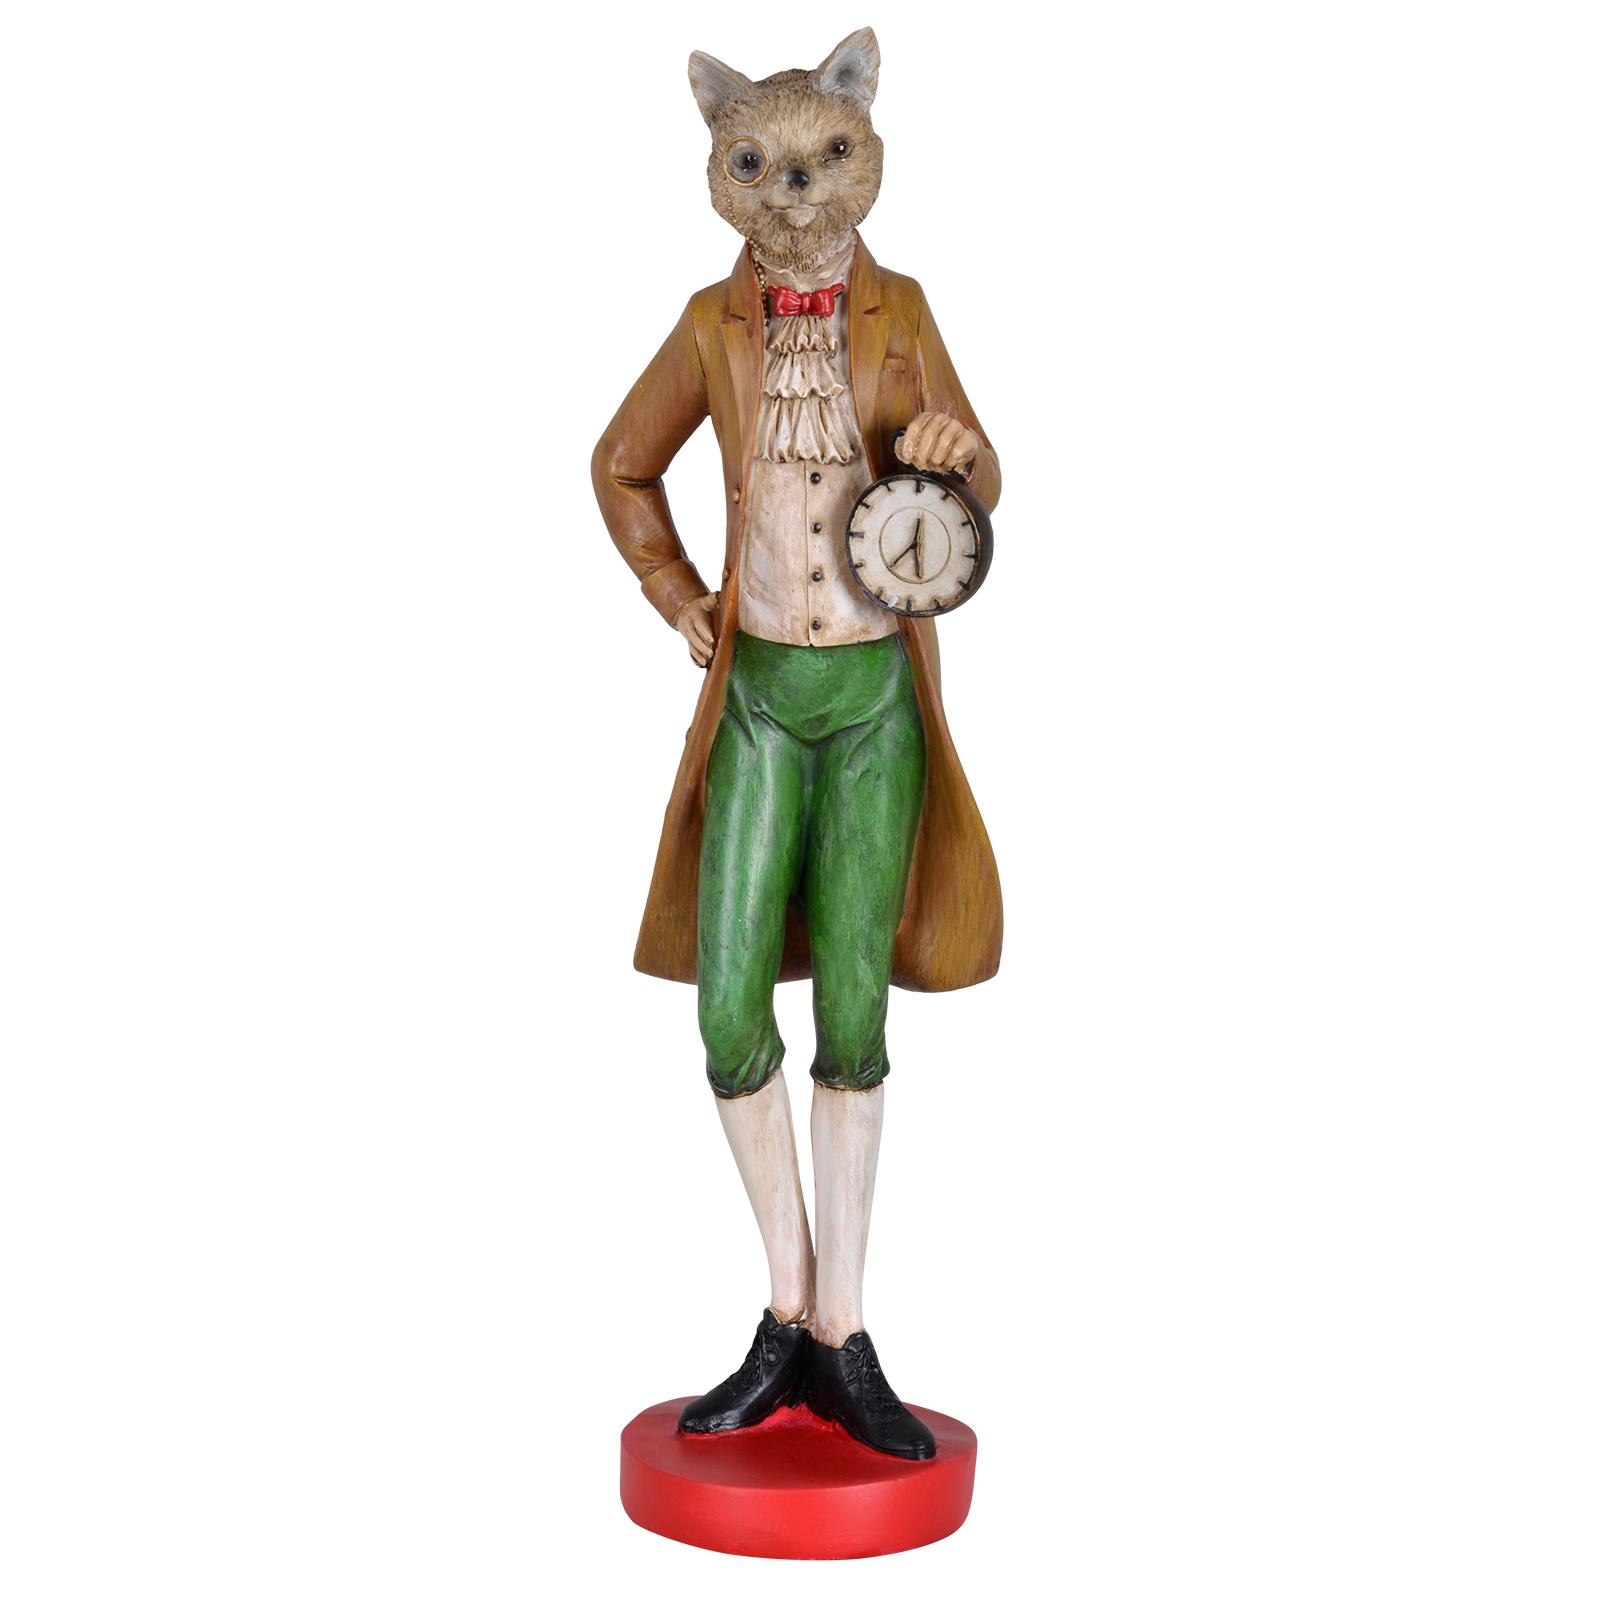 Novelty ornaments - Mr Animal Novelty Ornaments Victorian Statue Figure 43